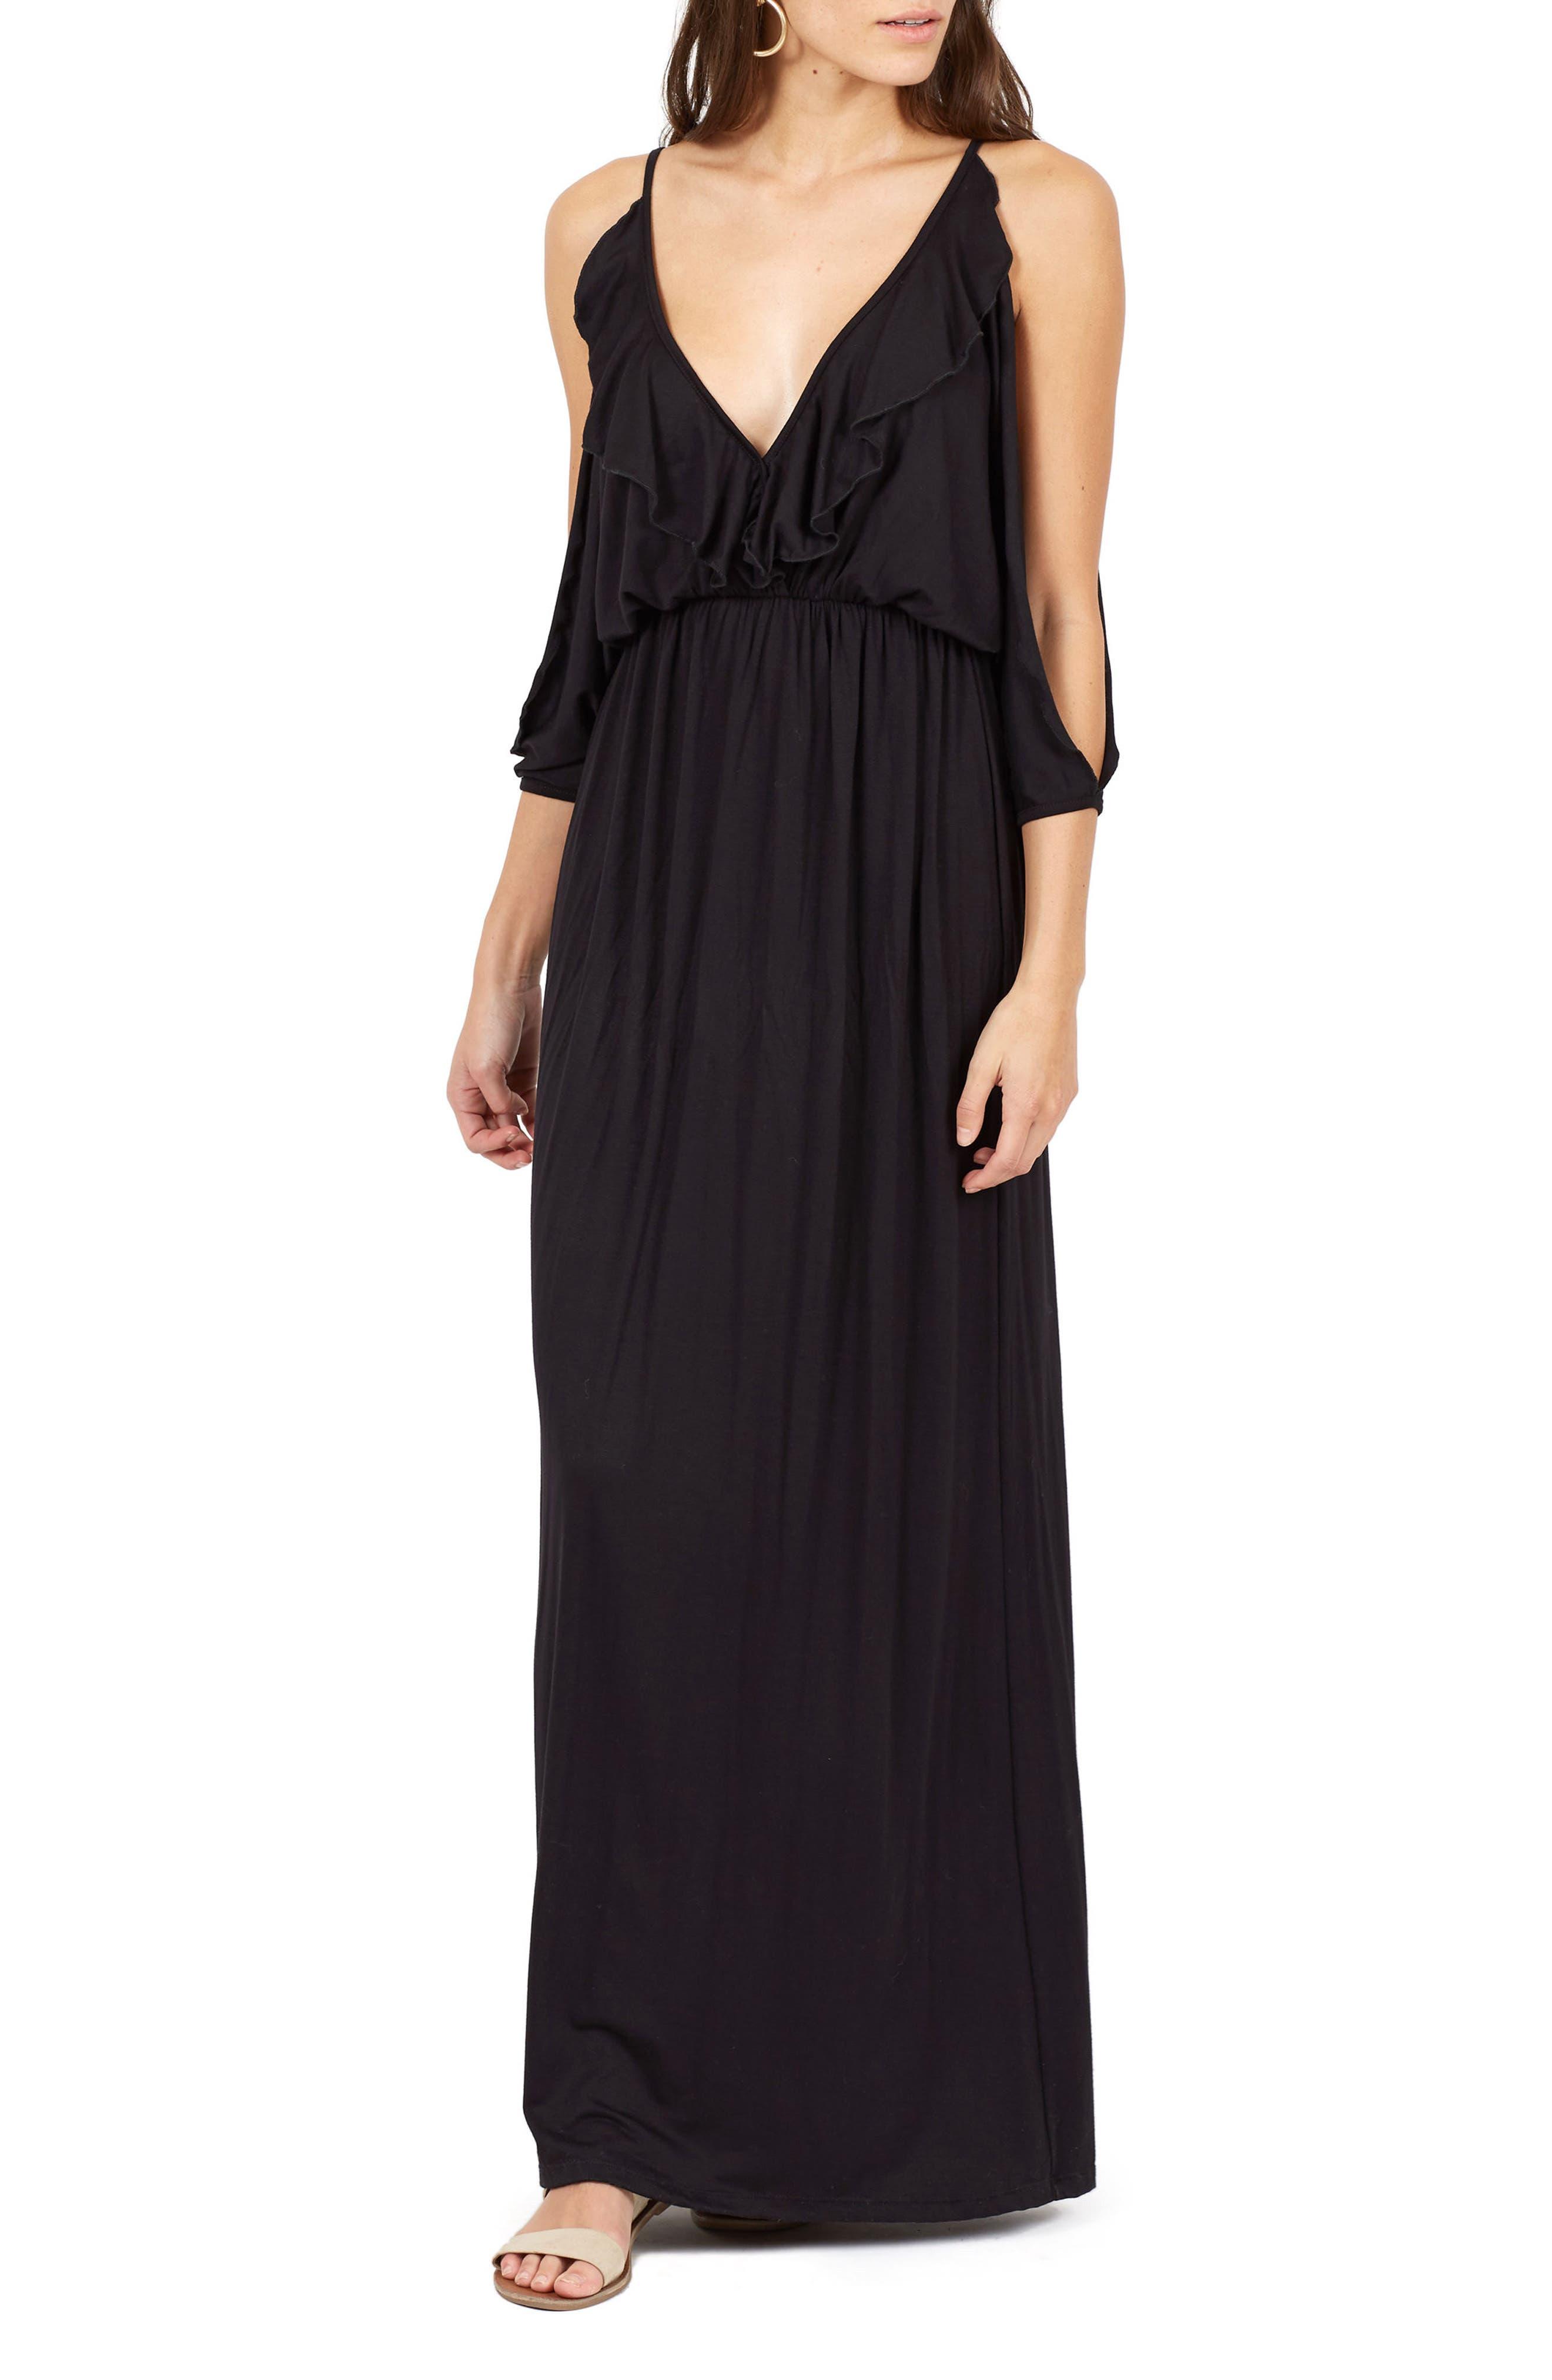 Main Image - Delacy Nia Cold Shoulder Maxi Dress